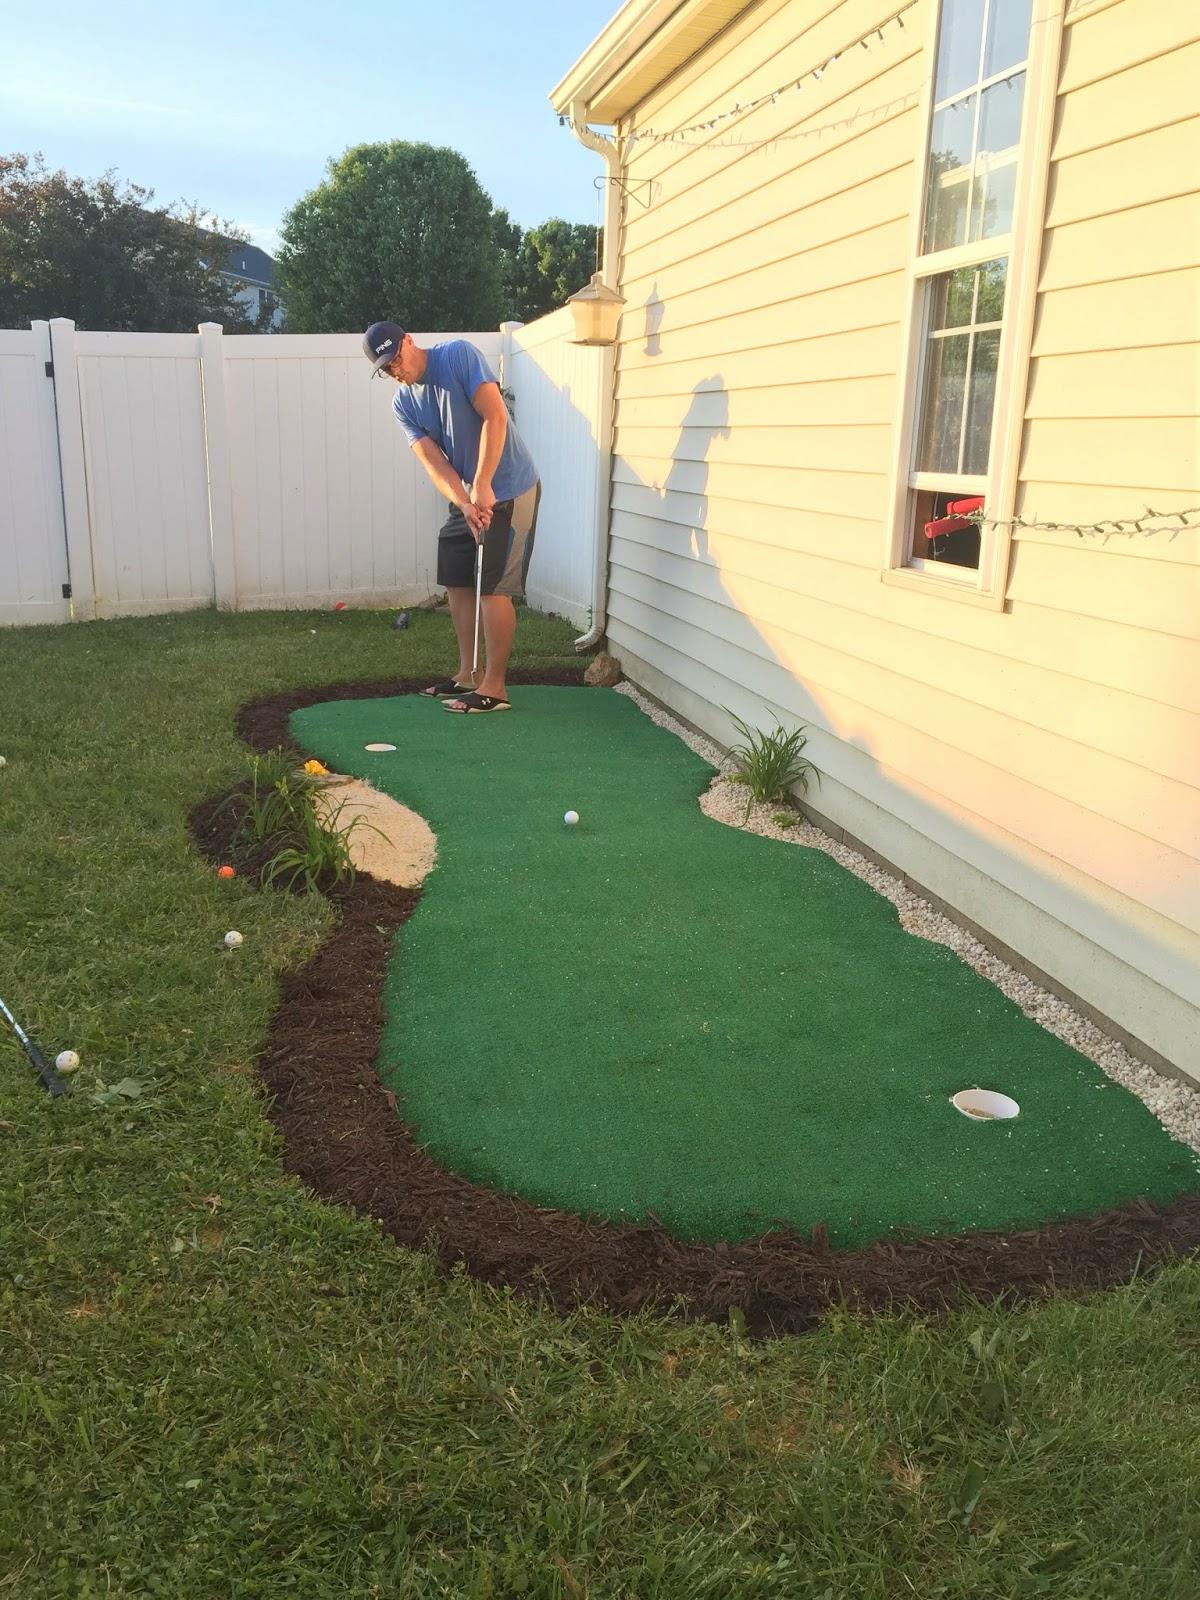 Little Bit Funky: How to make a backyard putting green ... on Putting Green Ideas For Backyard id=87705